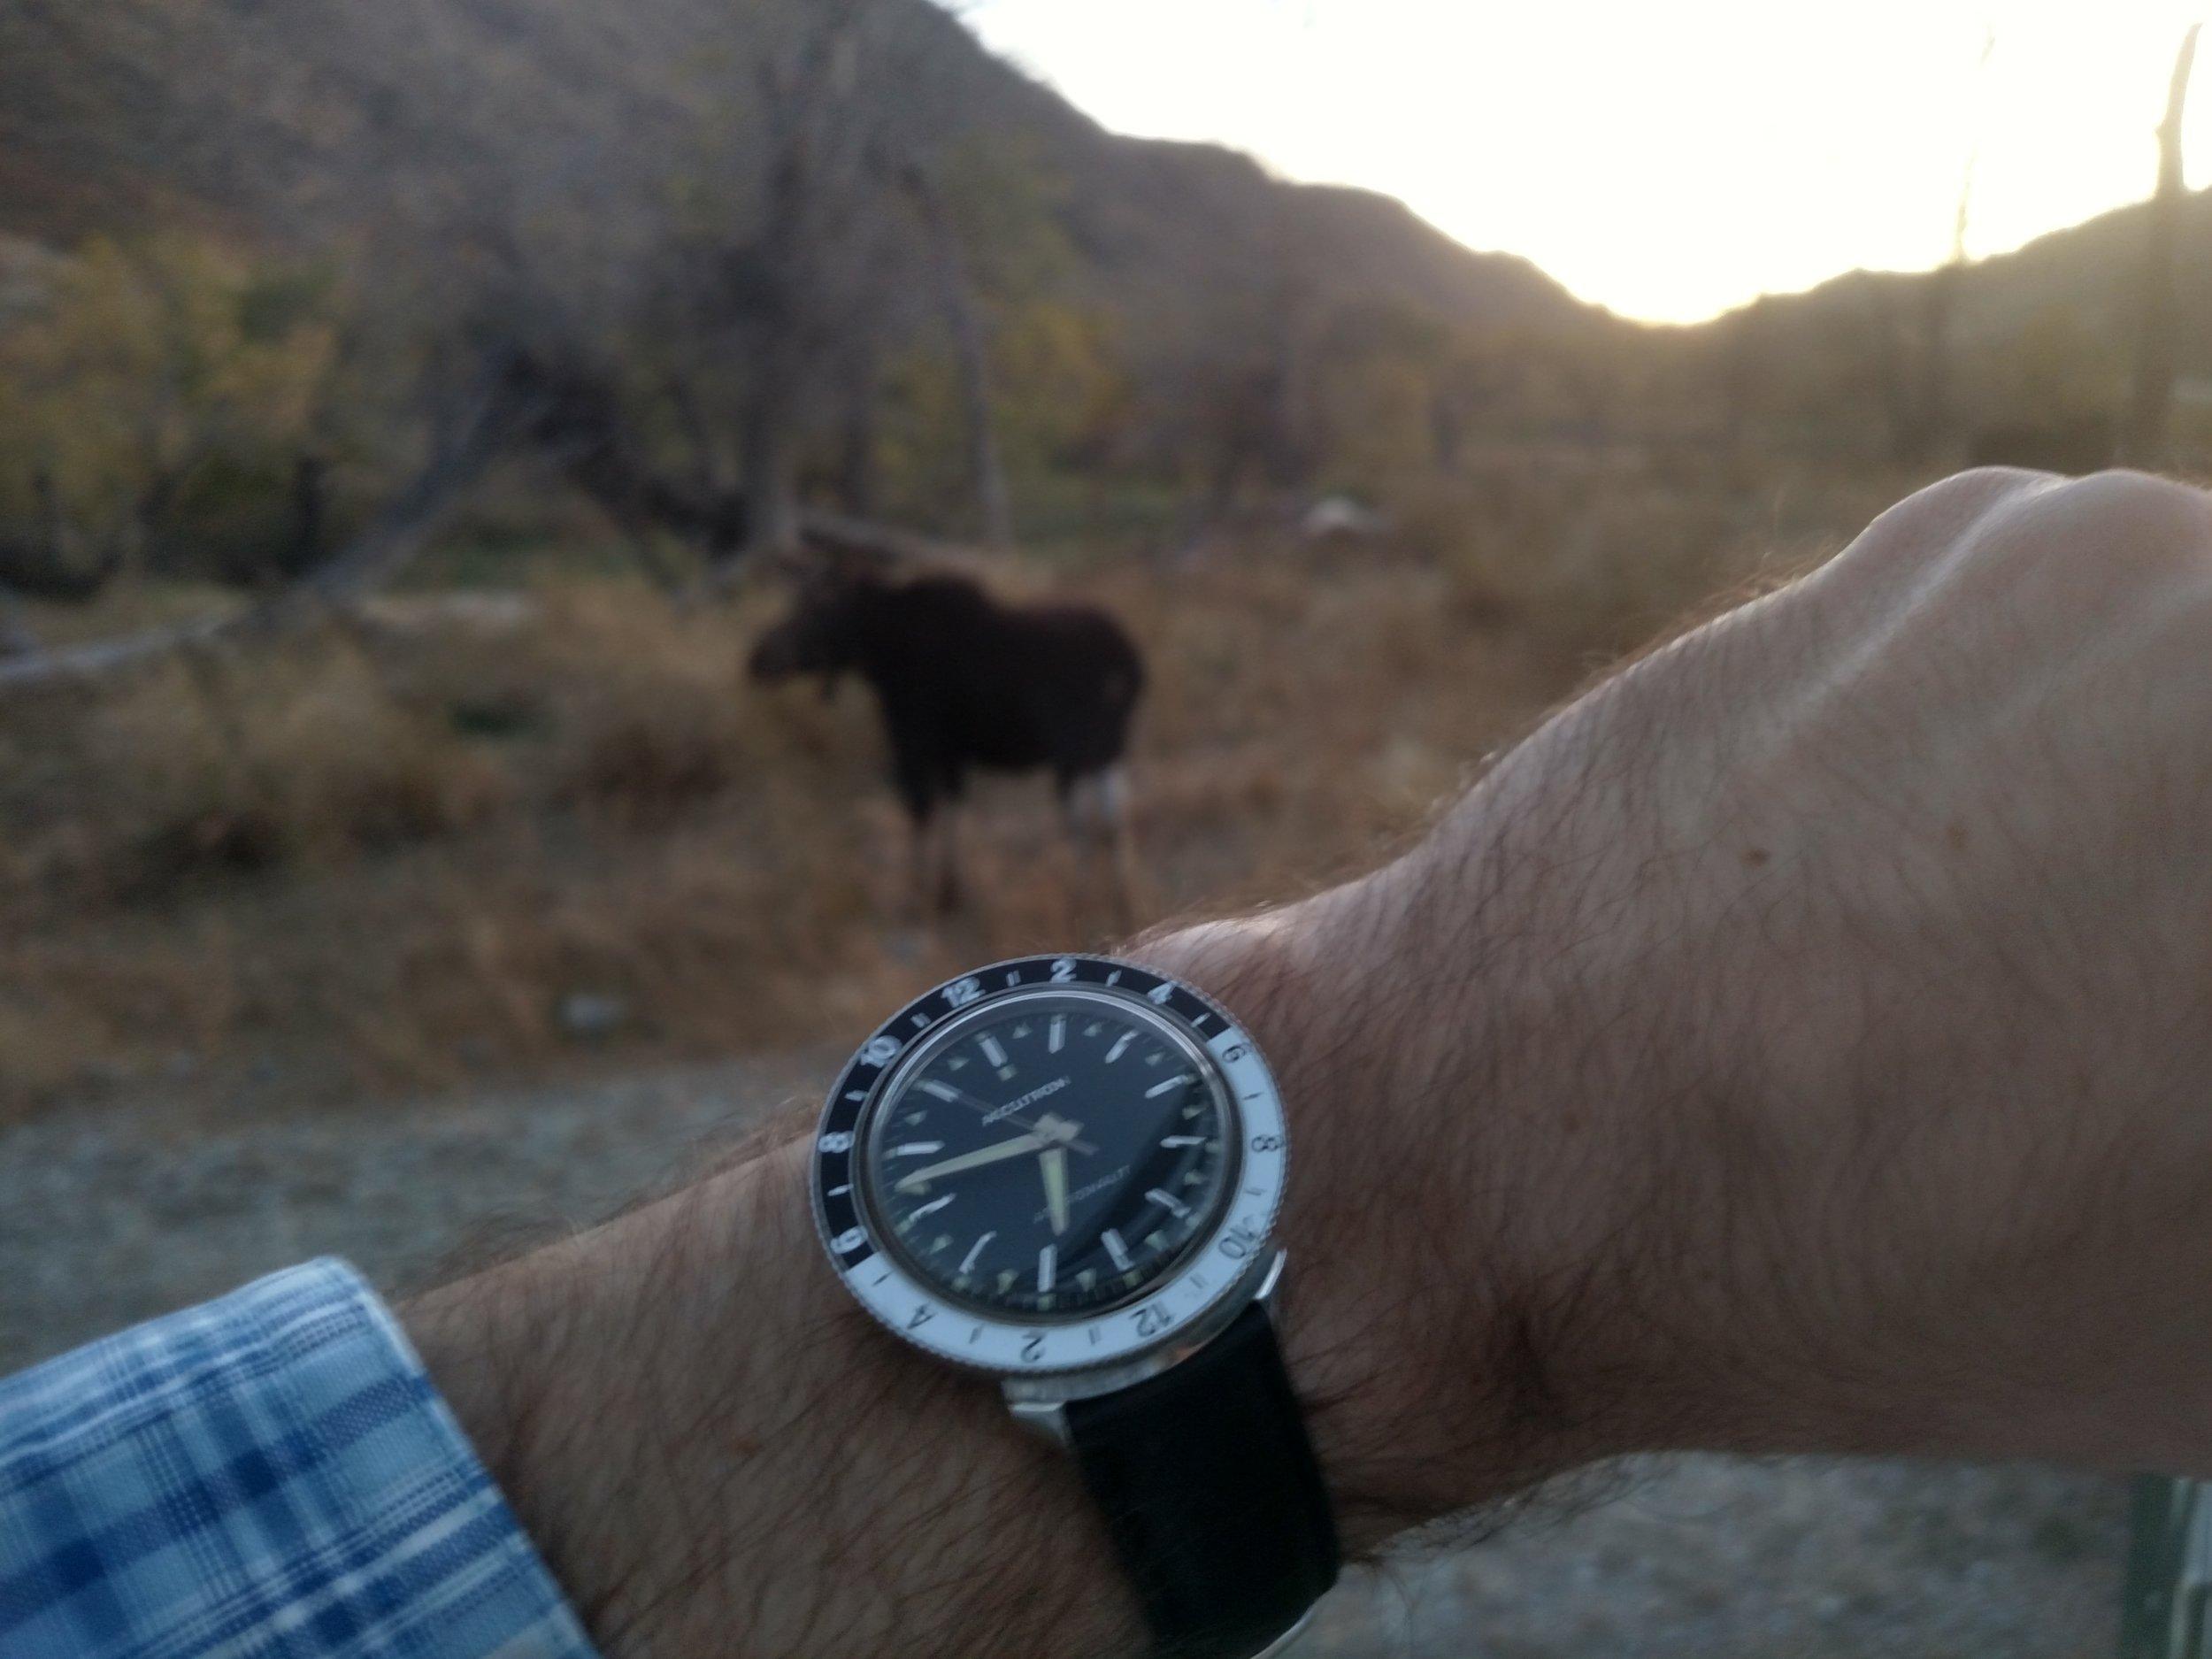 Moose-watching with this 1968 Bulova Accutron Astronaut  Northeast of Bosler, Wyoming